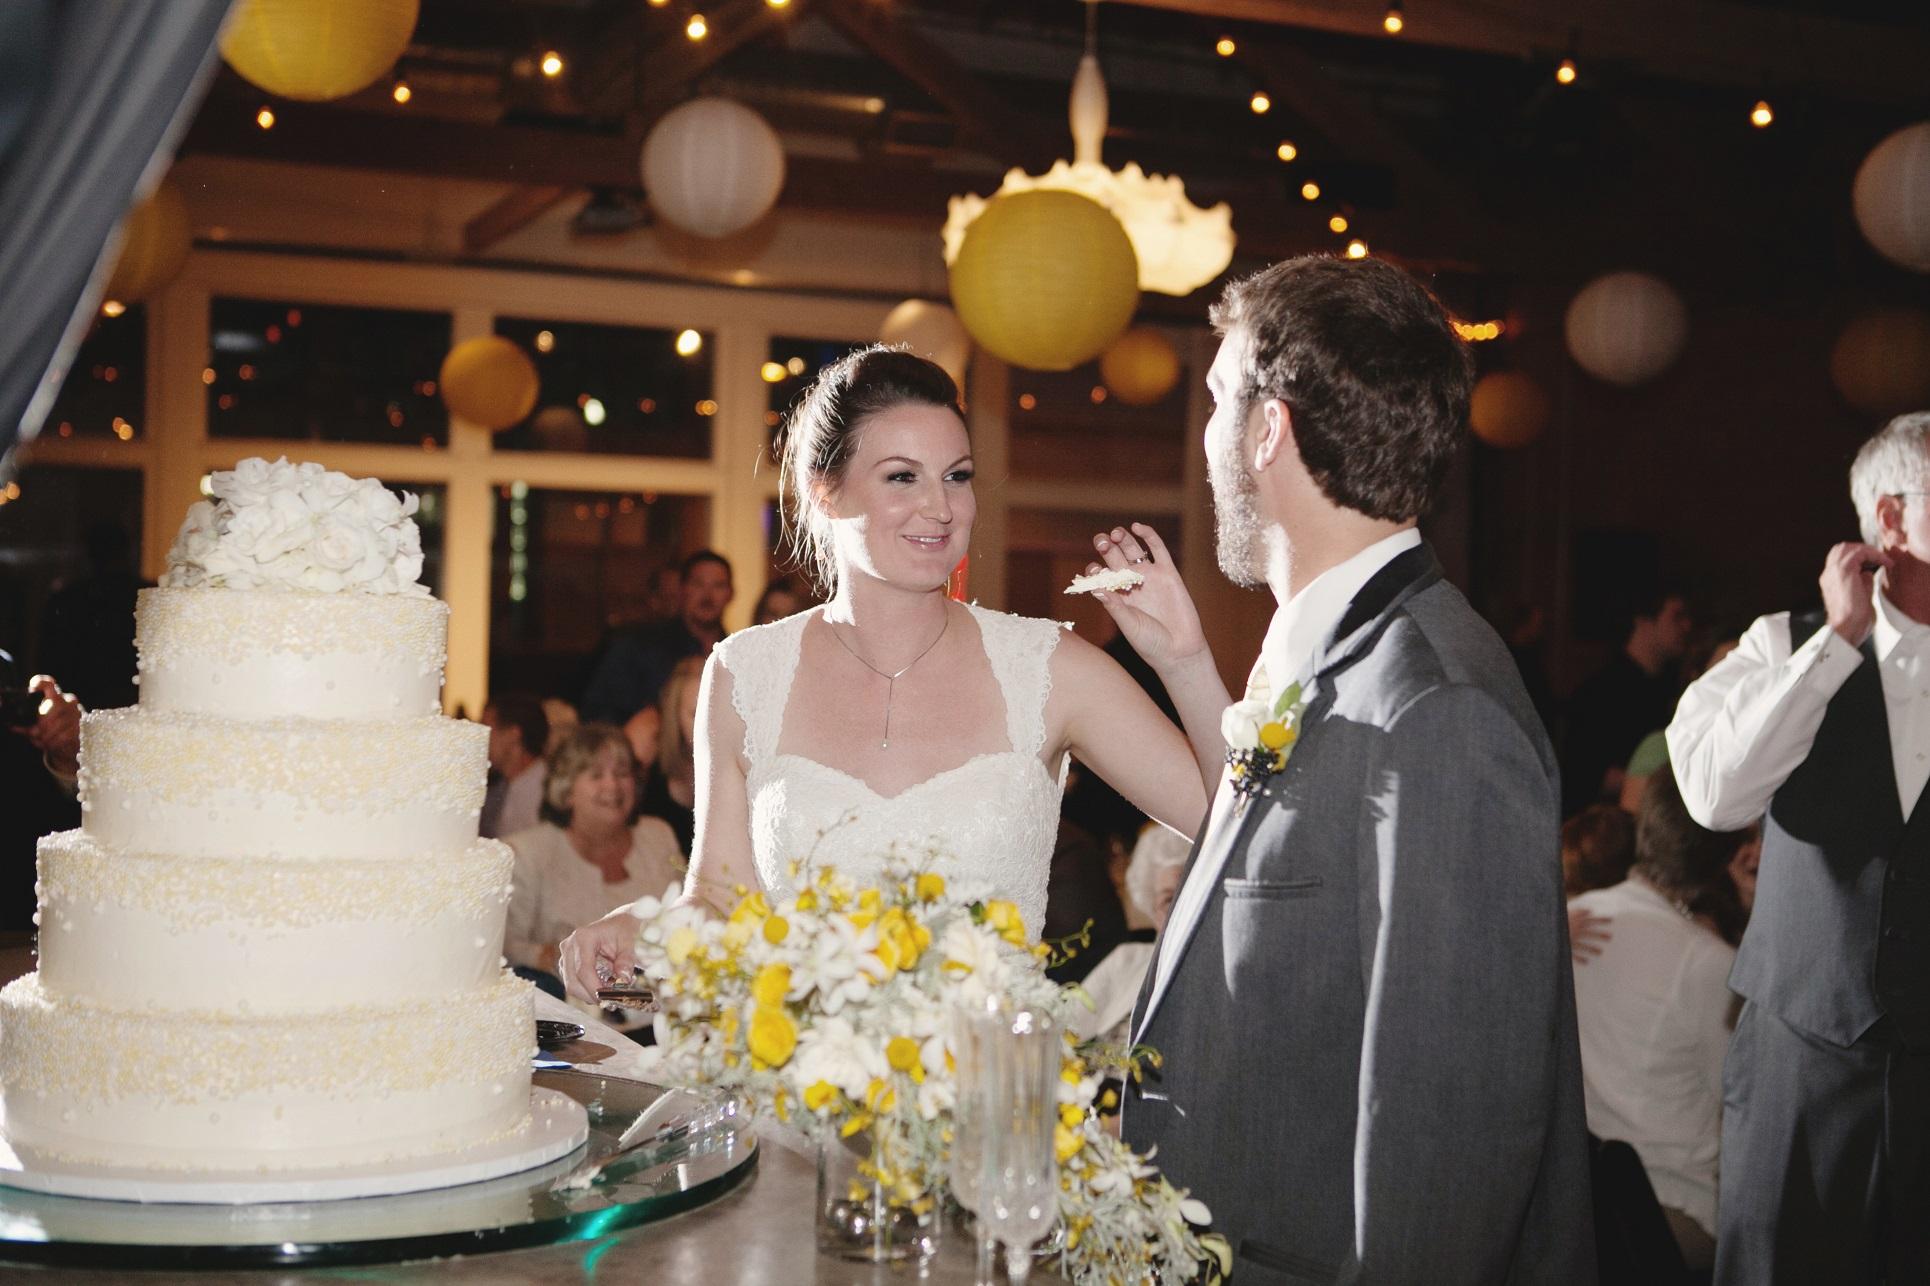 berg cake cutting